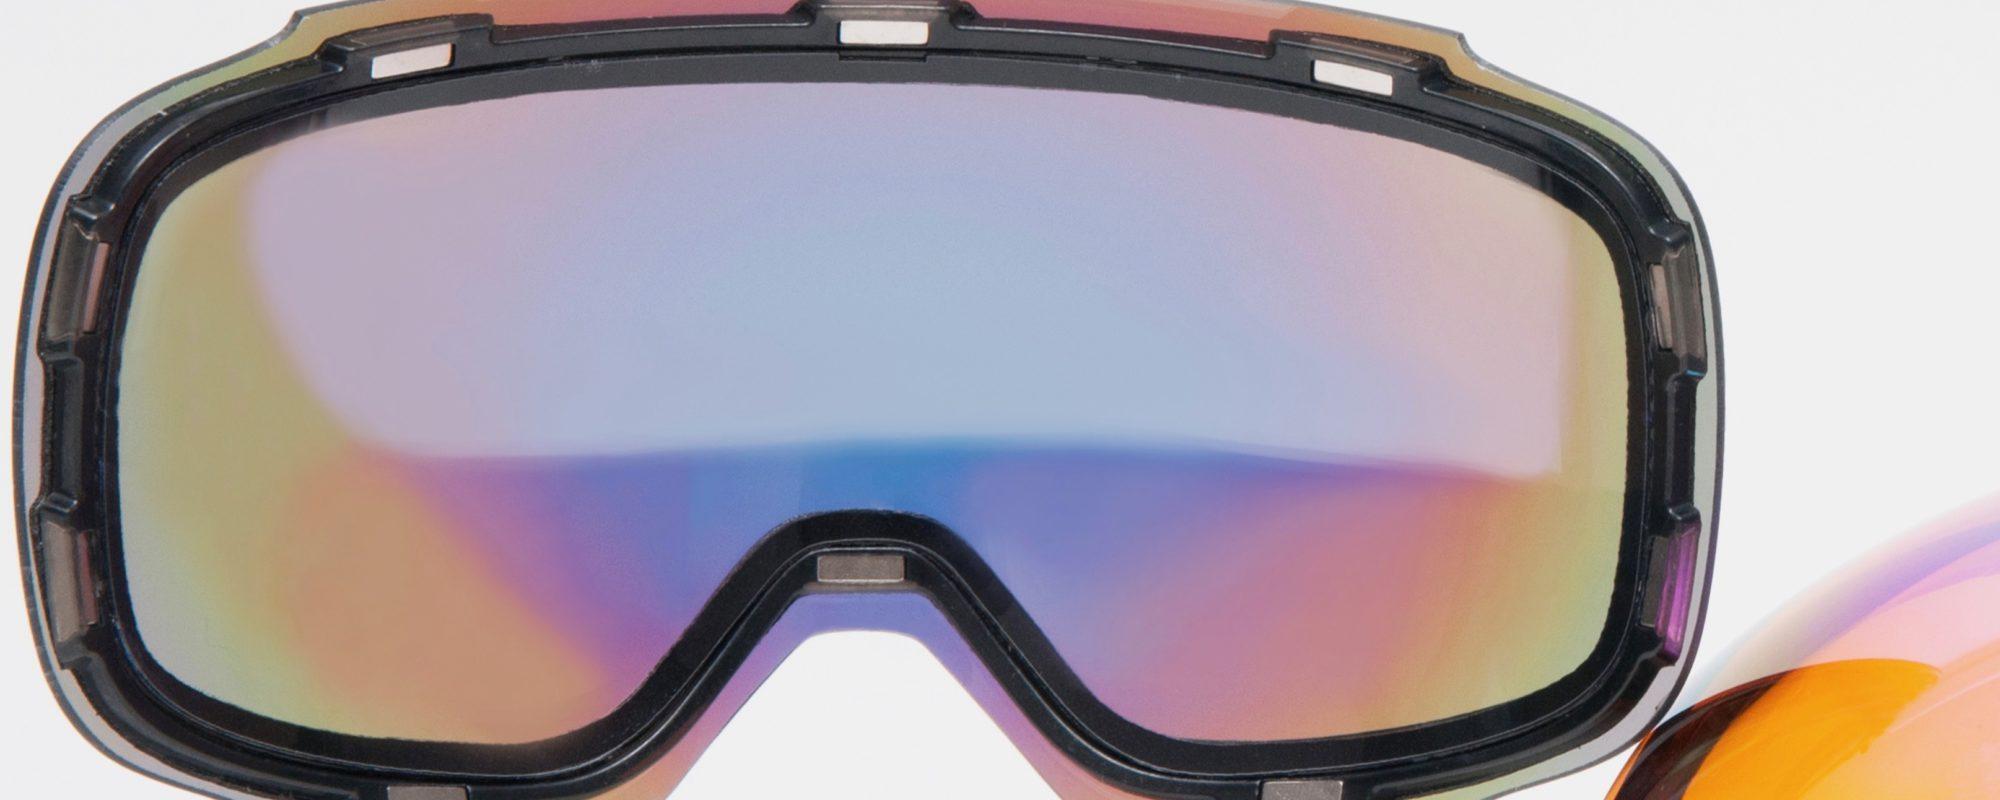 Delayon Eyewear Explorer Dual Lens Construction